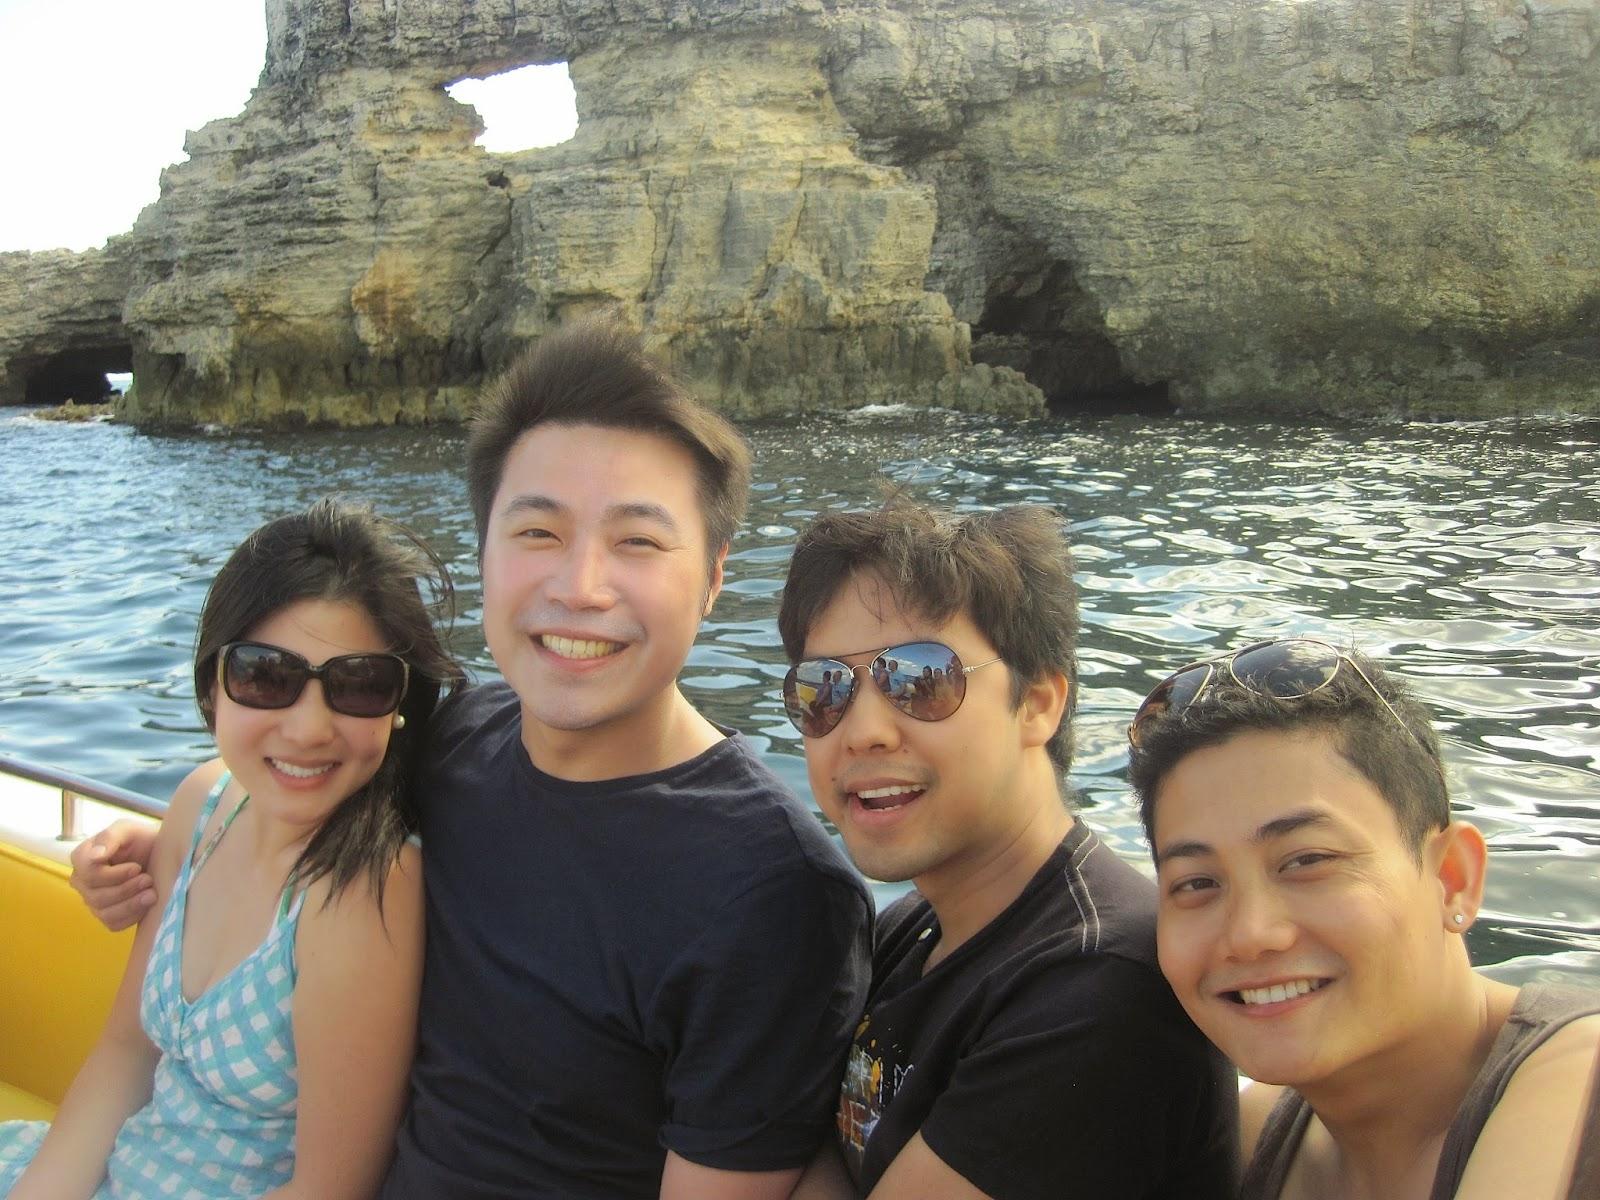 Comino Caves Cruise, Malta